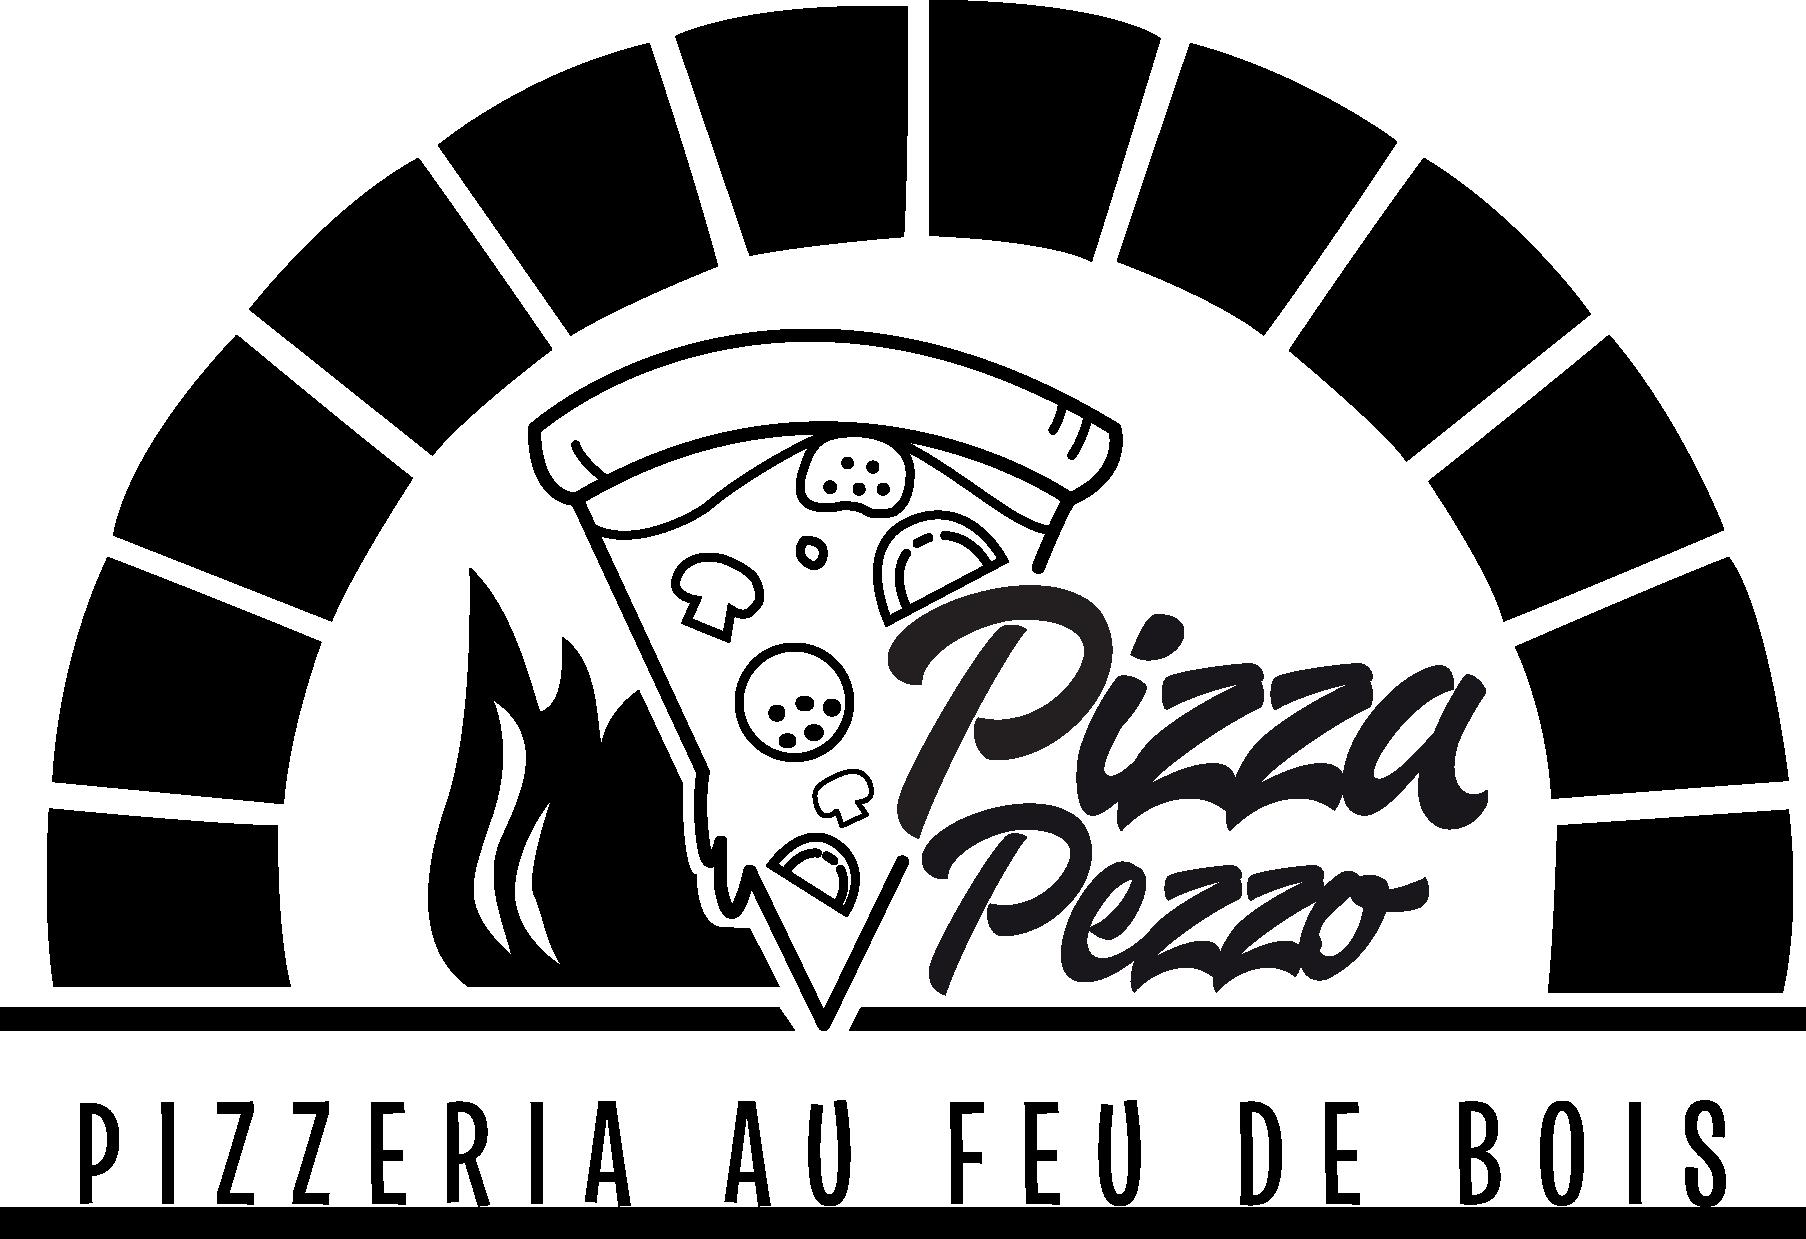 Pizza Pezzo pizzeria